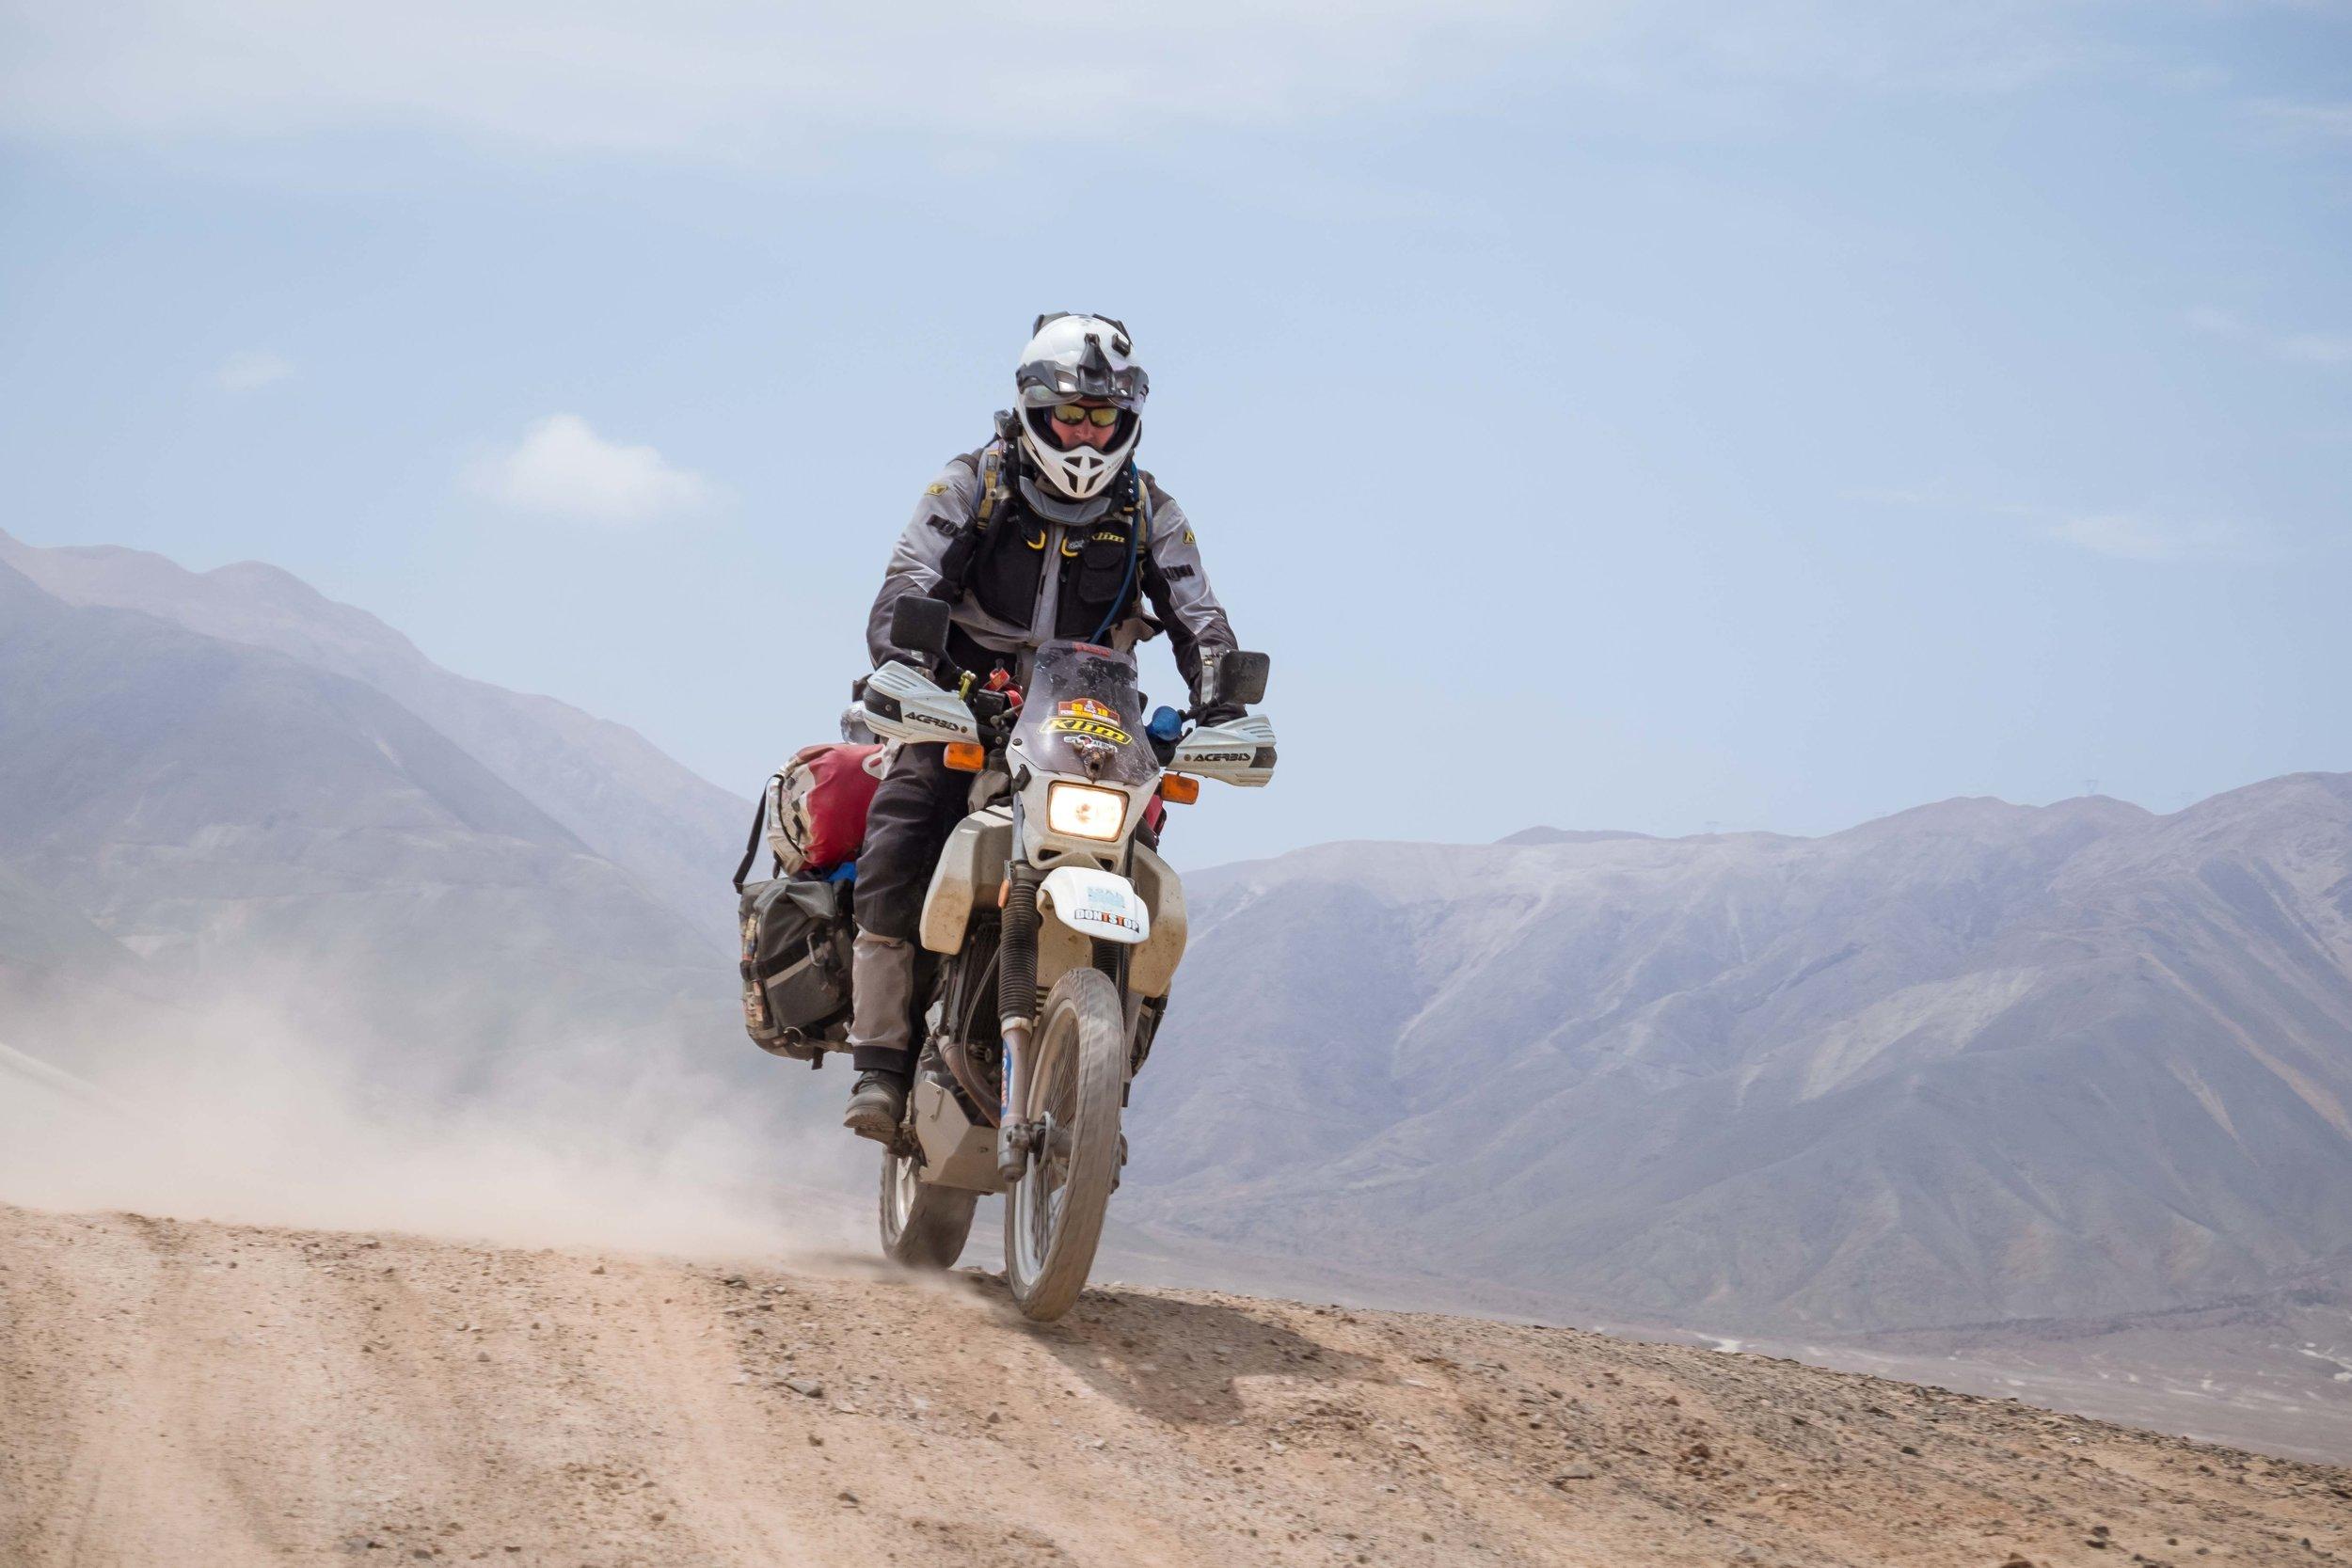 michnus-elsebie-olivier-pikipiki-overland-adventure-rider-radio-motorcycle-podcast-15.jpg